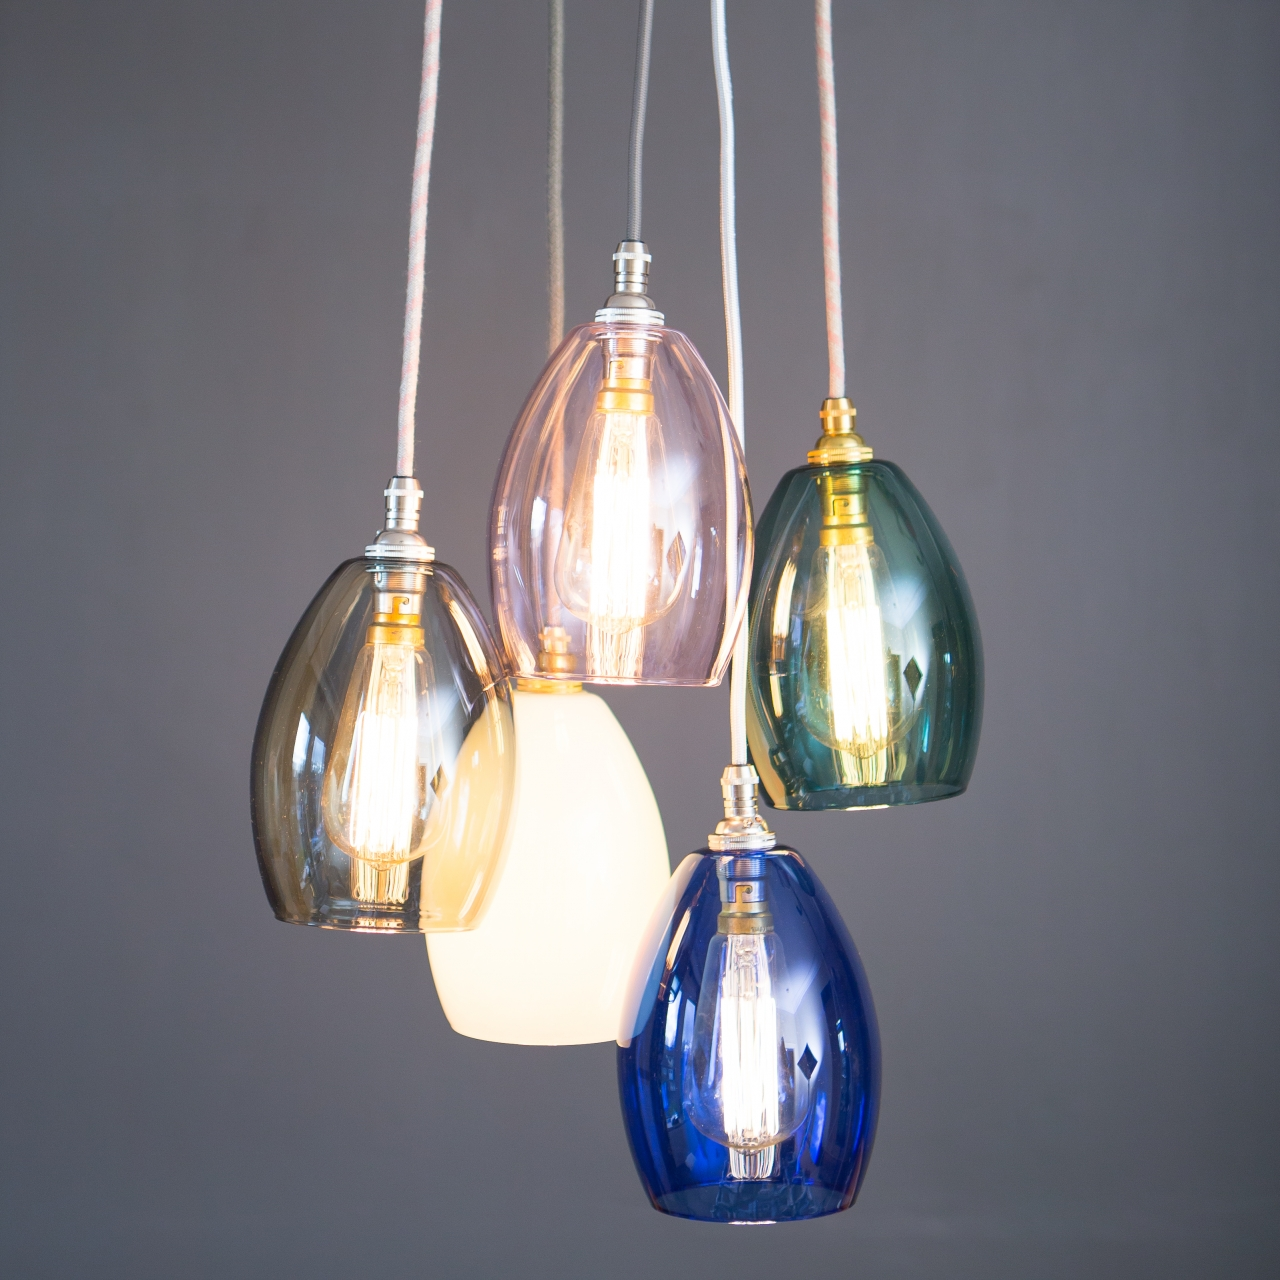 d5ddf9bbba8 Coloured Glass Cluster Light Bertie - Glow Lighting